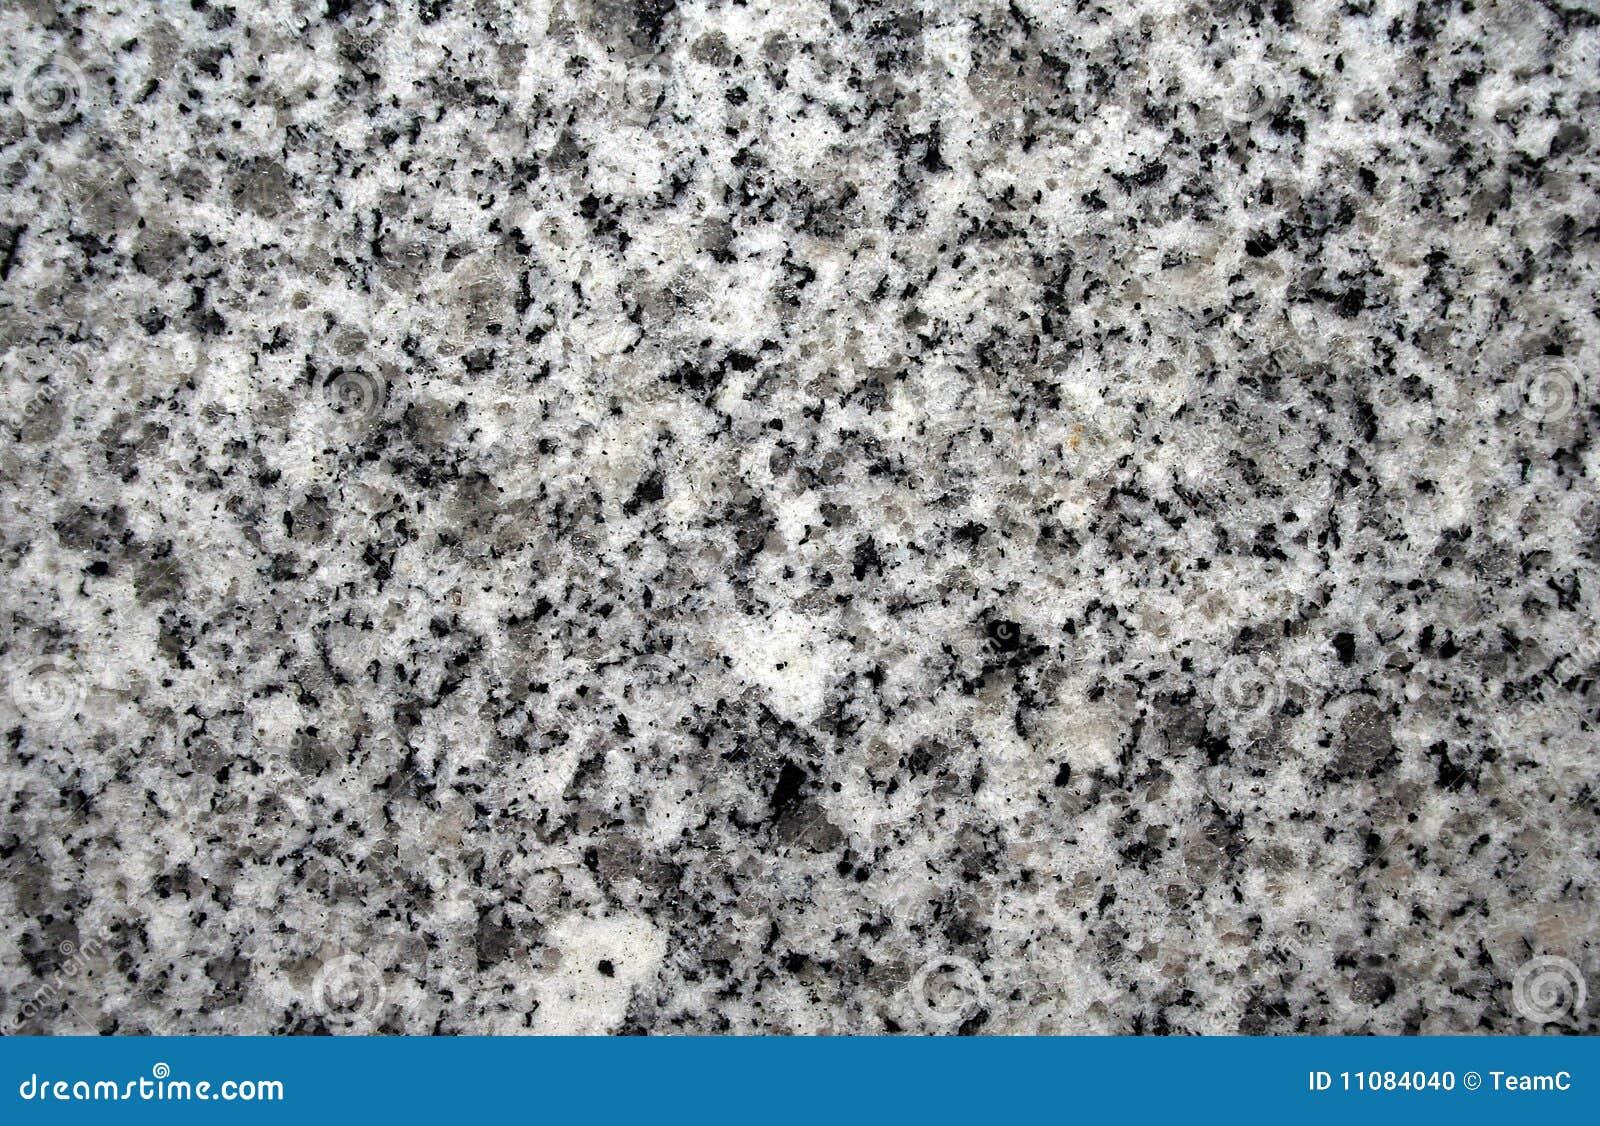 Black And White Granite : Black and gray granite stock photo image